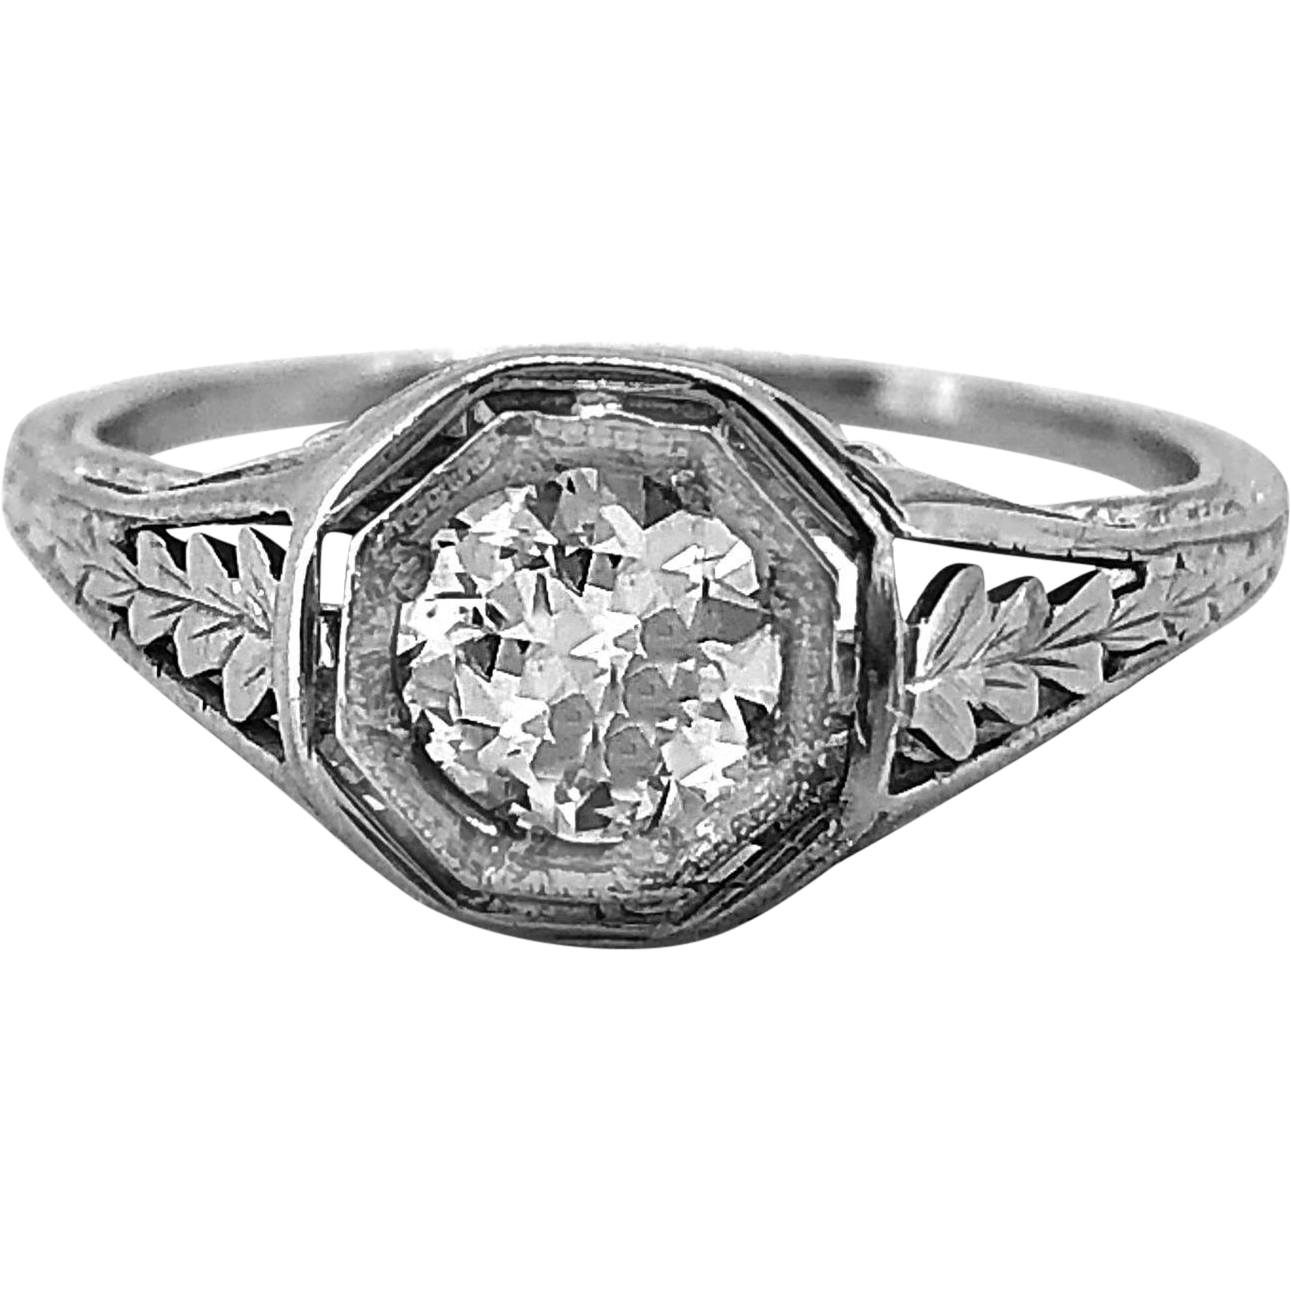 Antique Engagement Ring .50ct. Diamond & 18K White Gold Art Deco - J35984